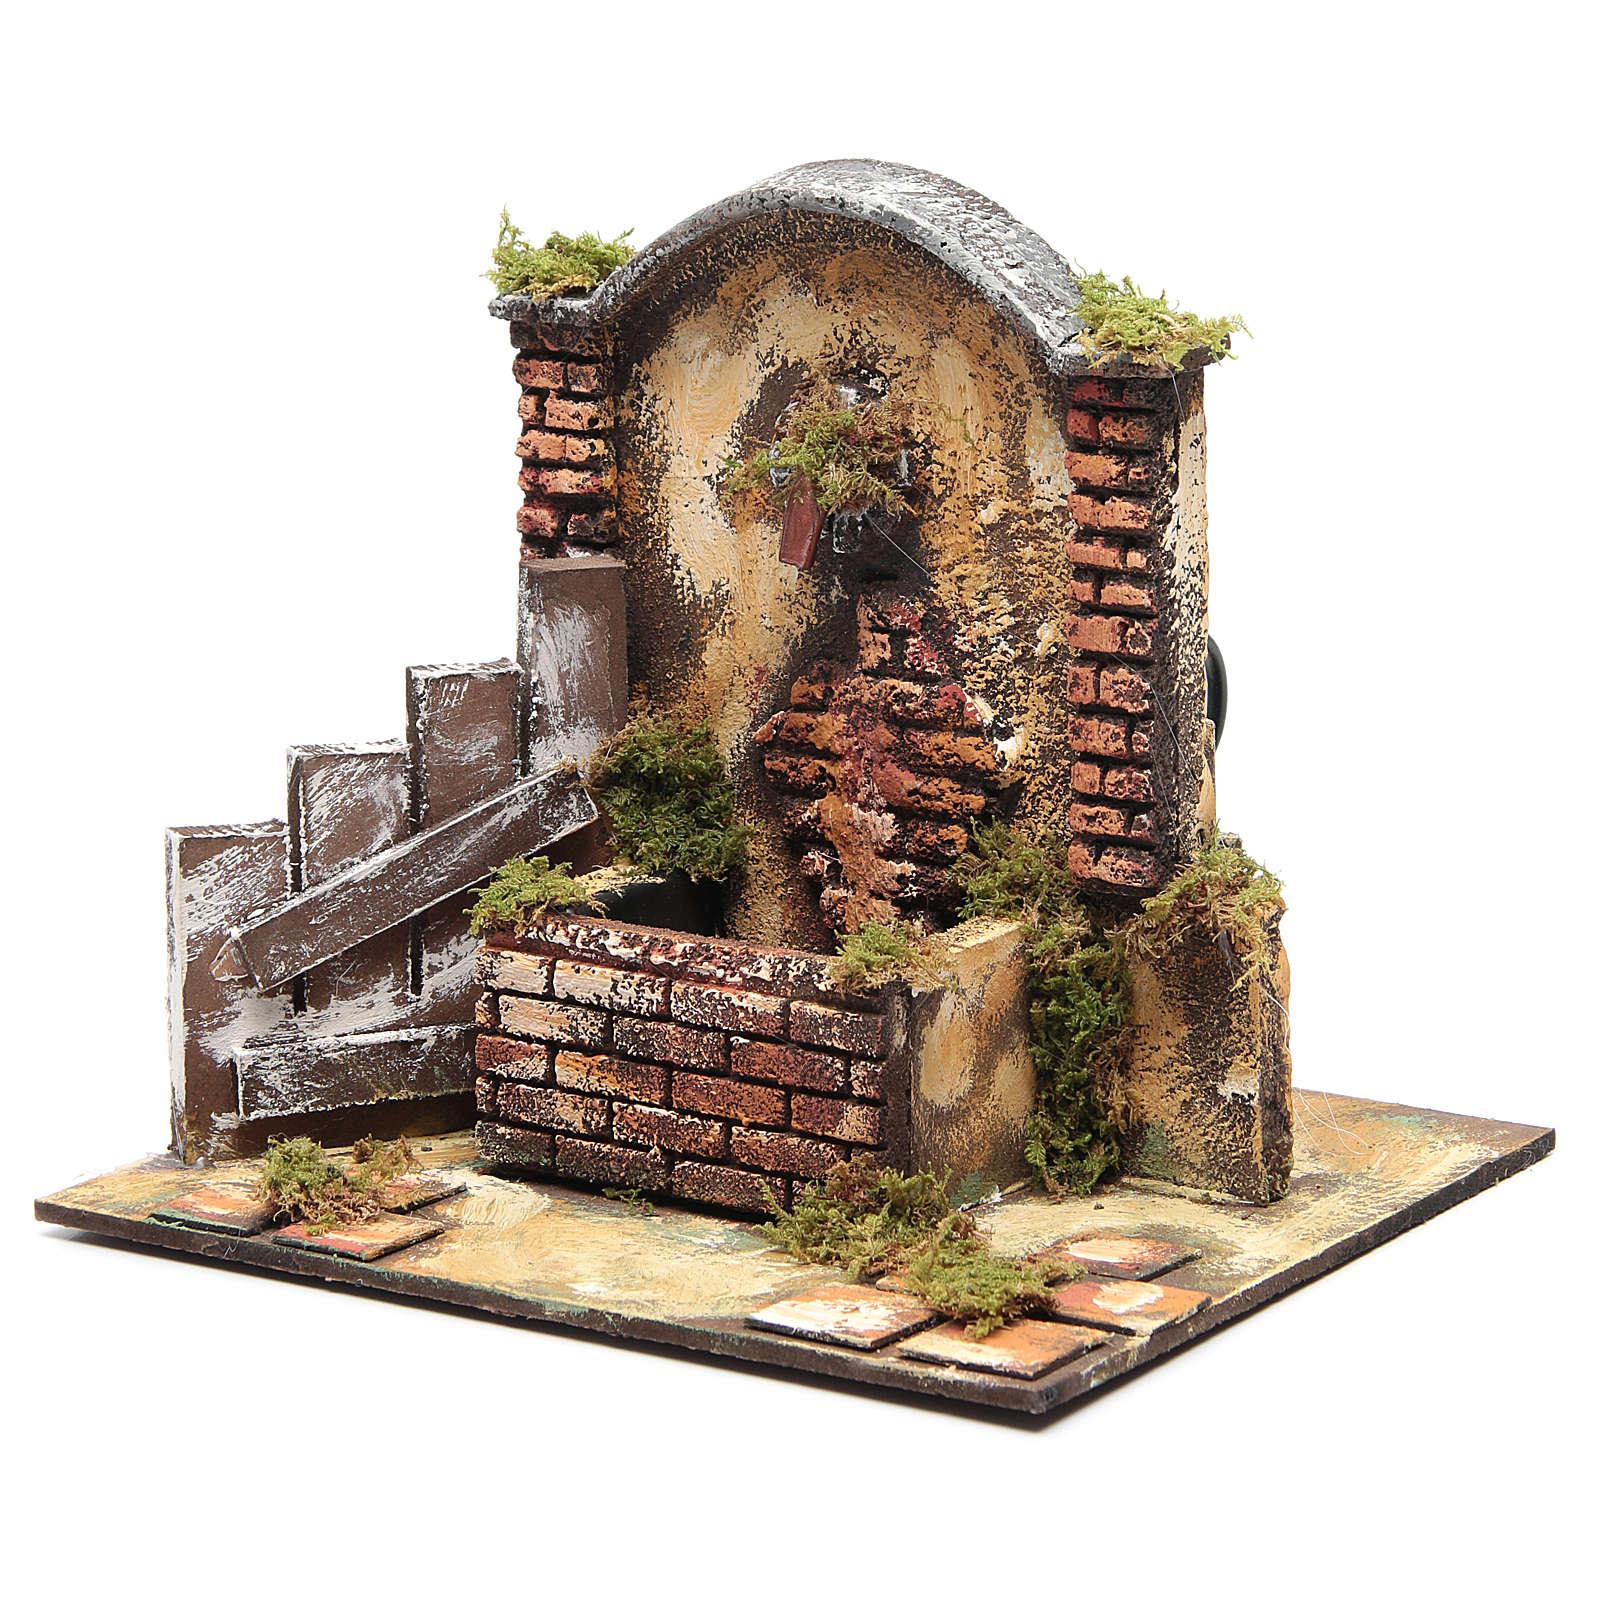 Resin fountain for DIY nativity scene 25x25x20 cm 4